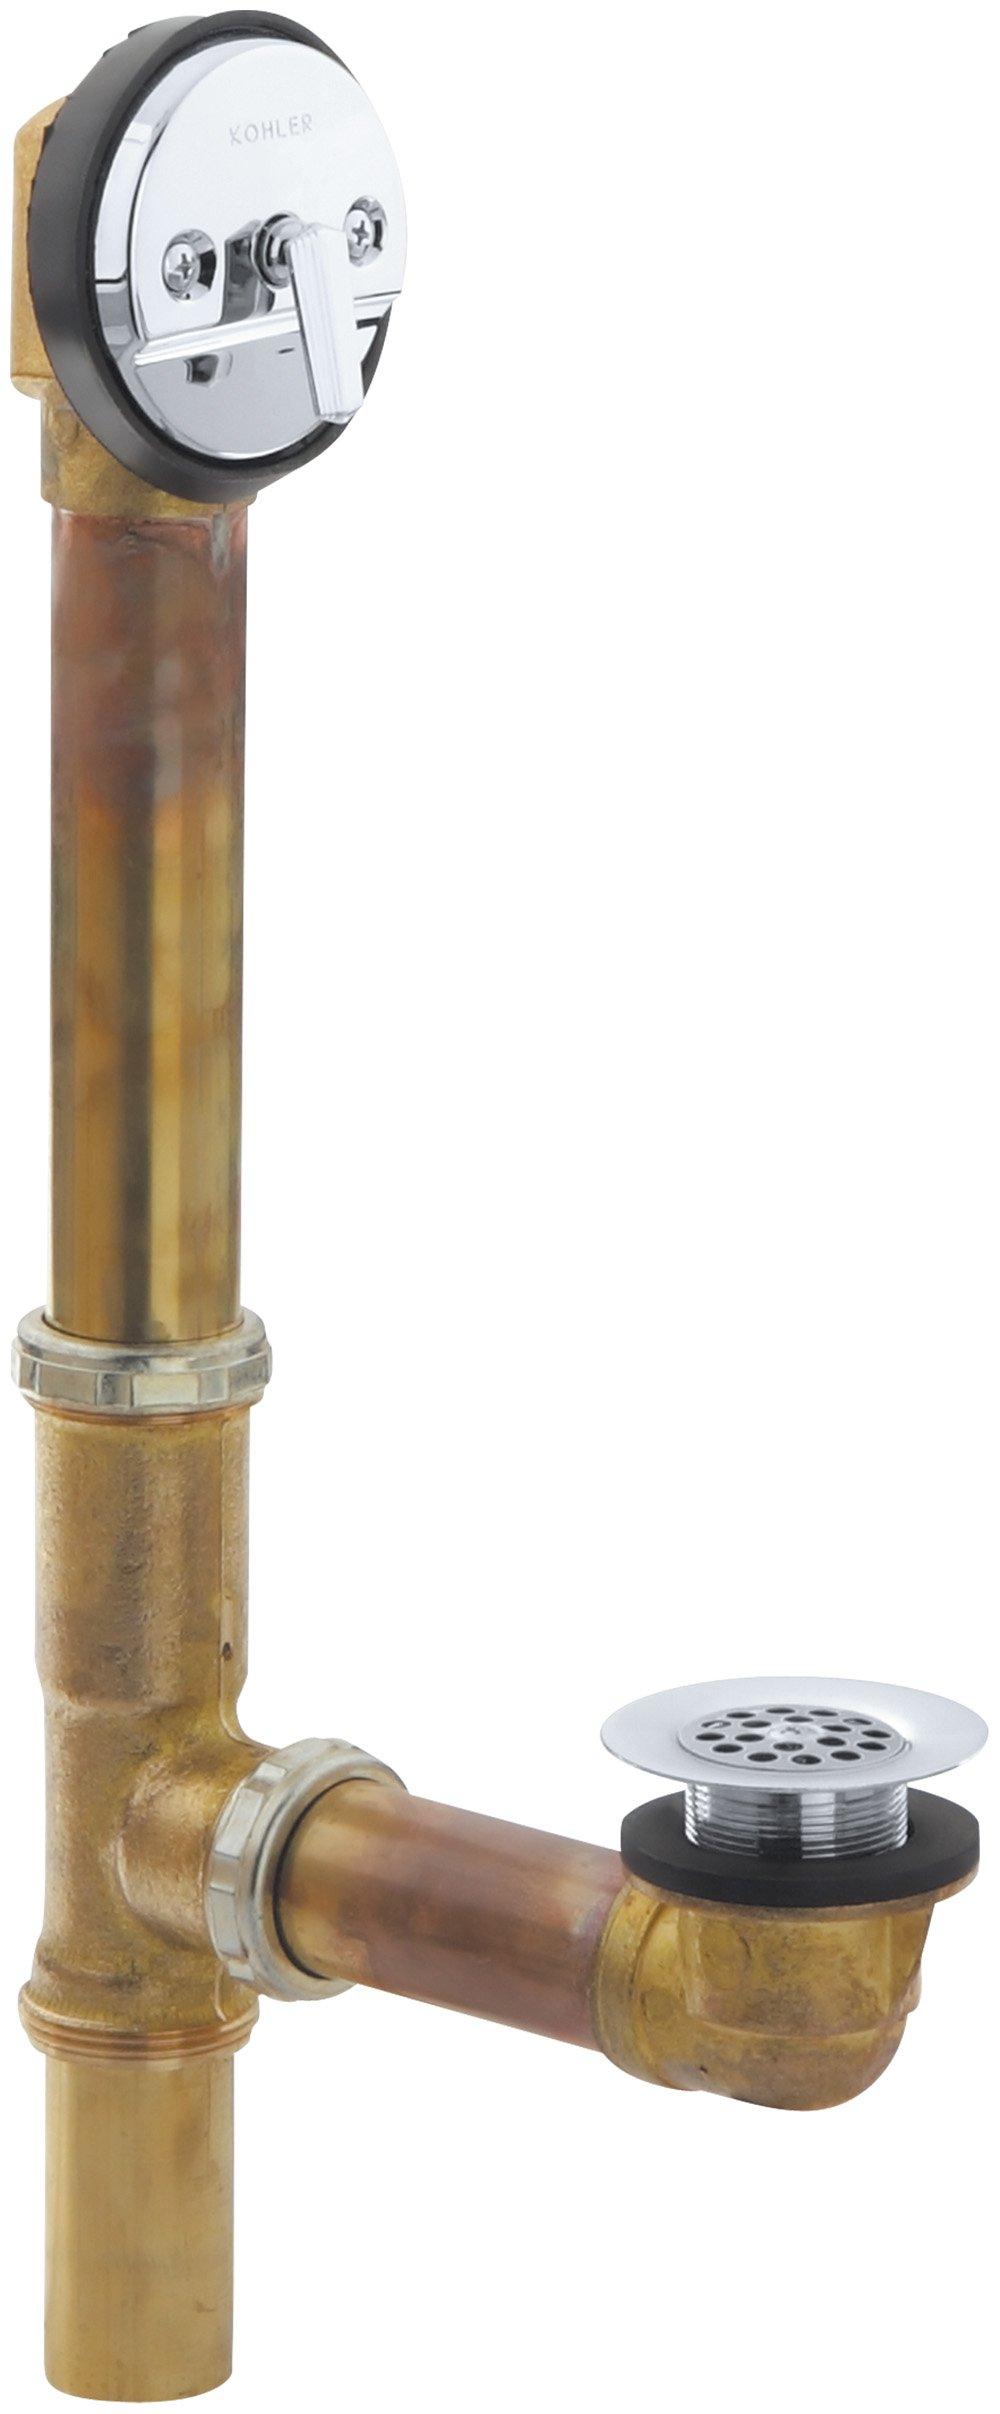 KOHLER 11677-CP K-11677-CP 1.5 Polished Chrome